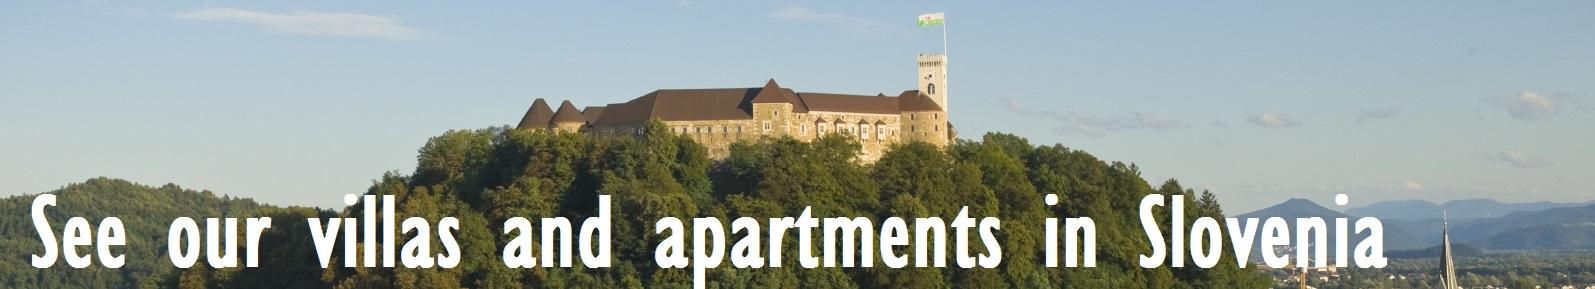 villas and apartments in Slovenia